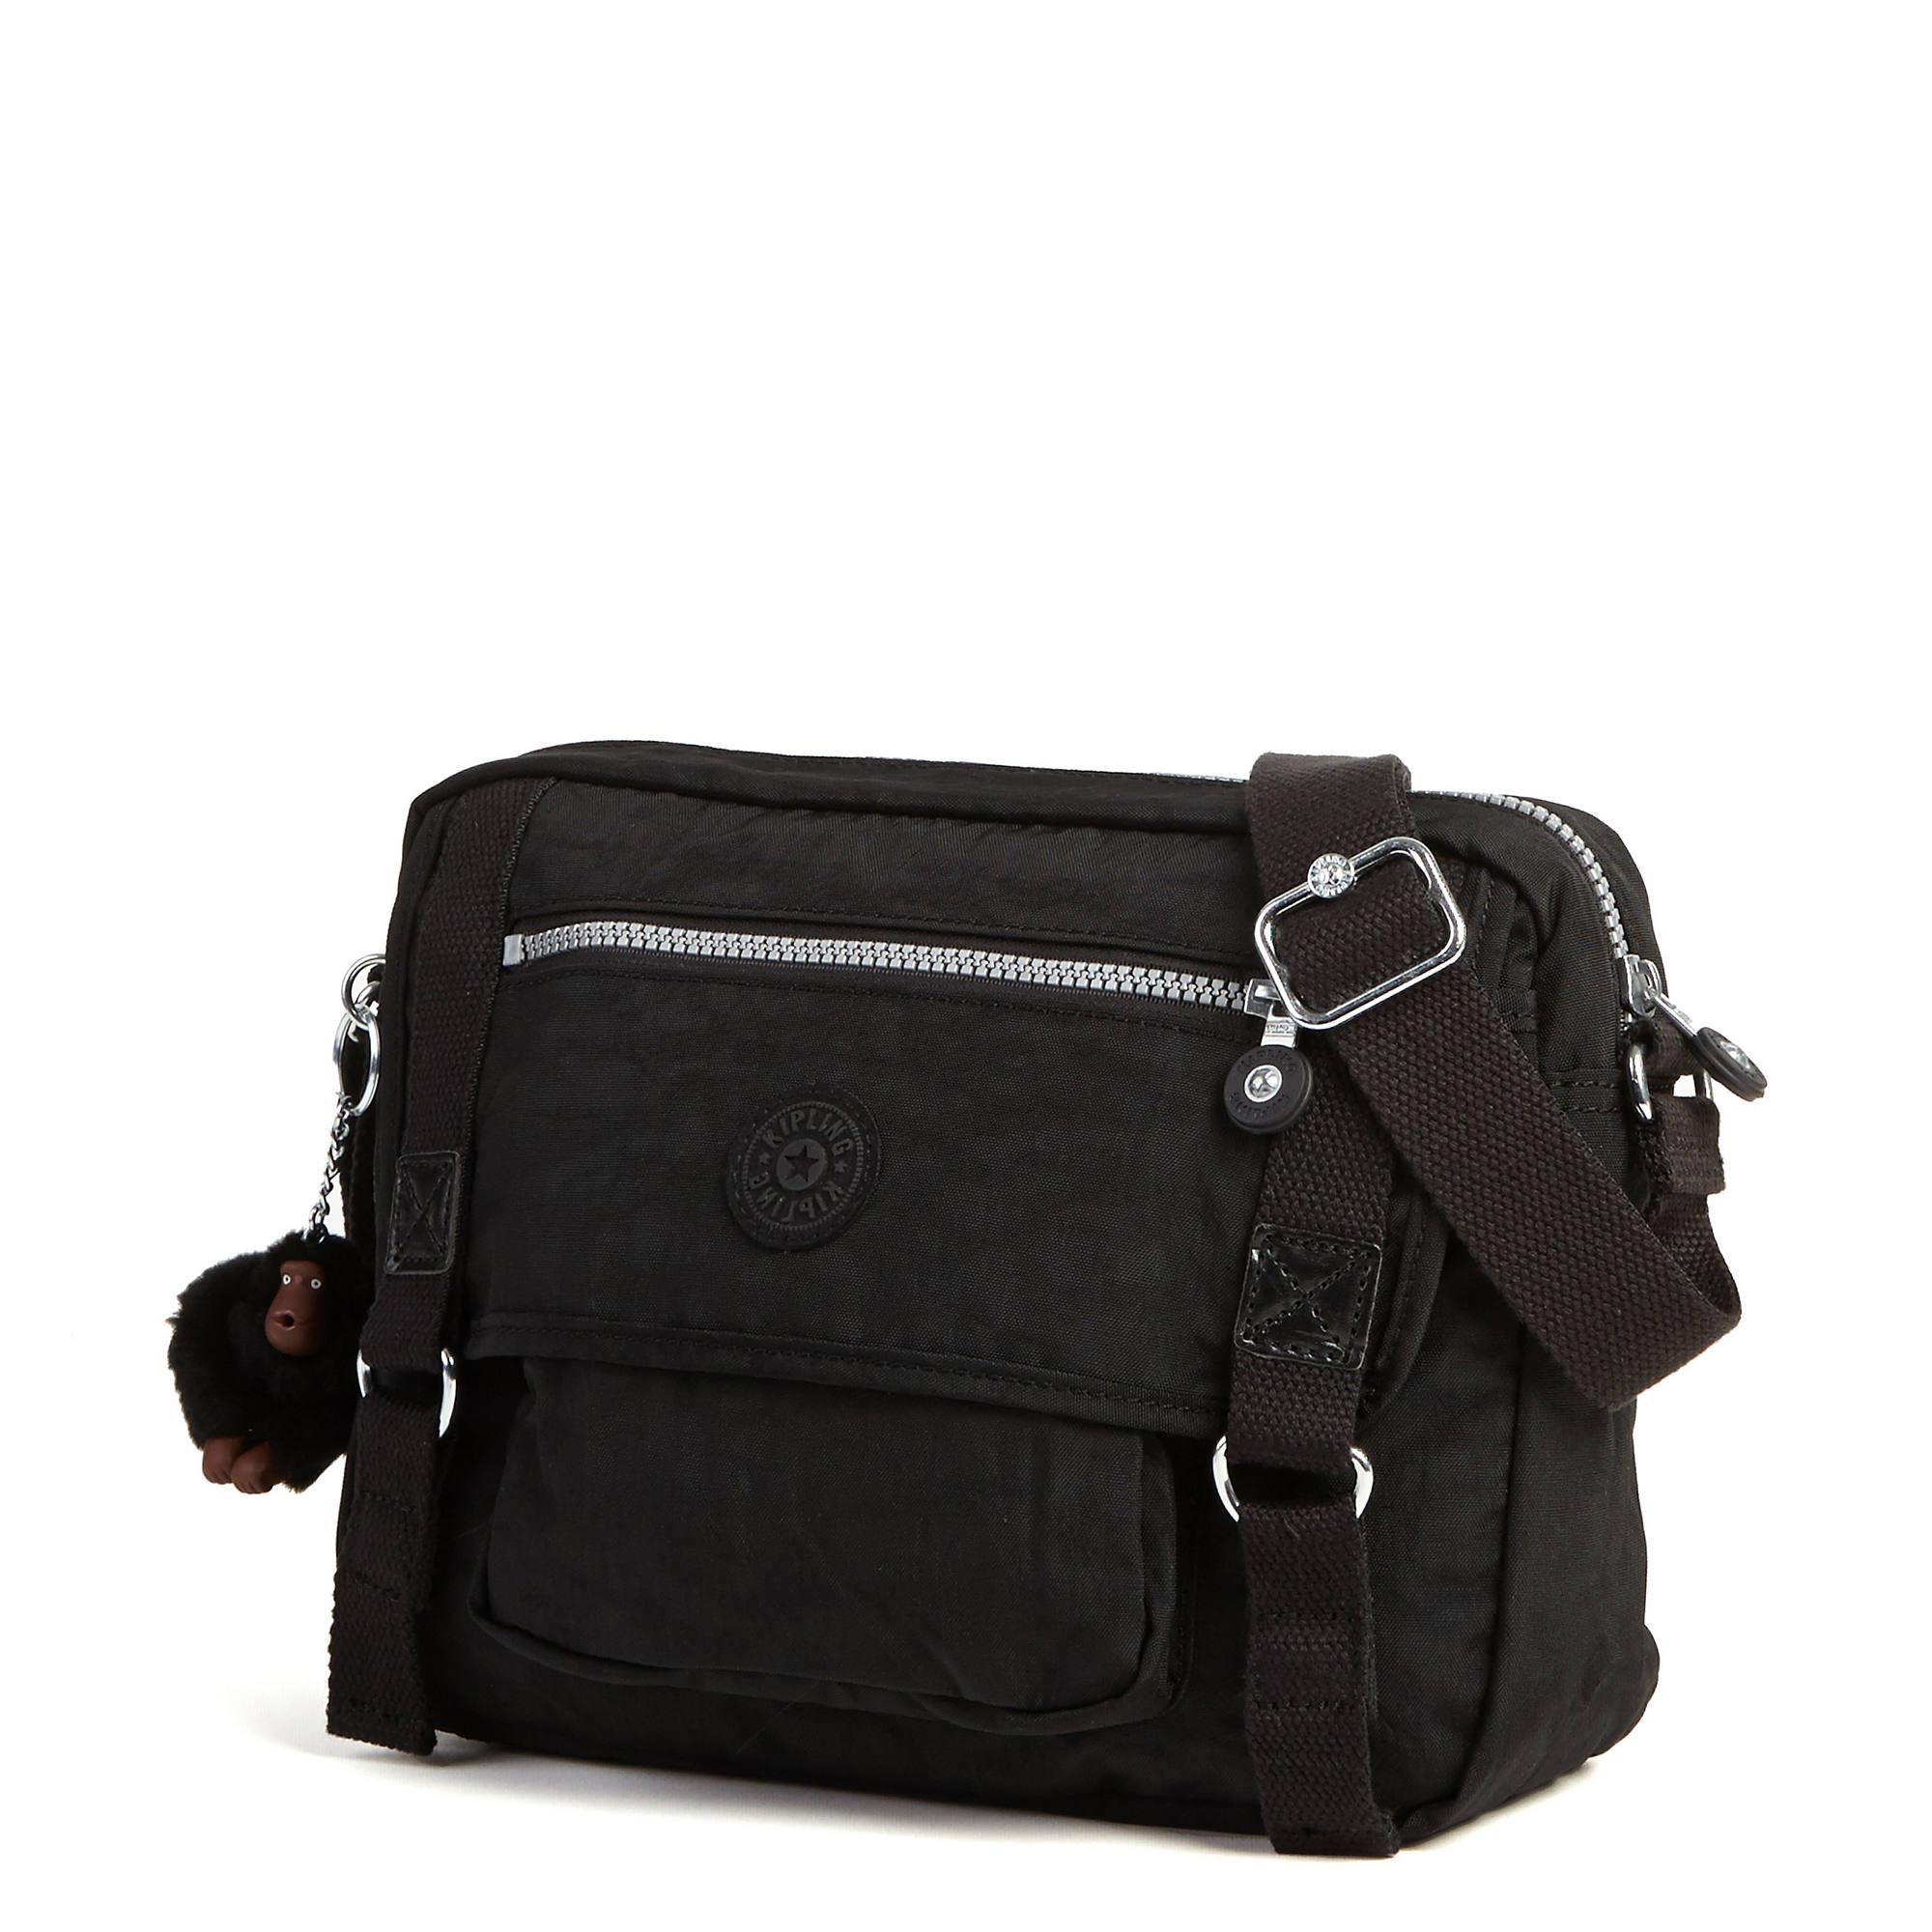 Gracy Crossbody Bag - Black Classic  5ec54fd42b218